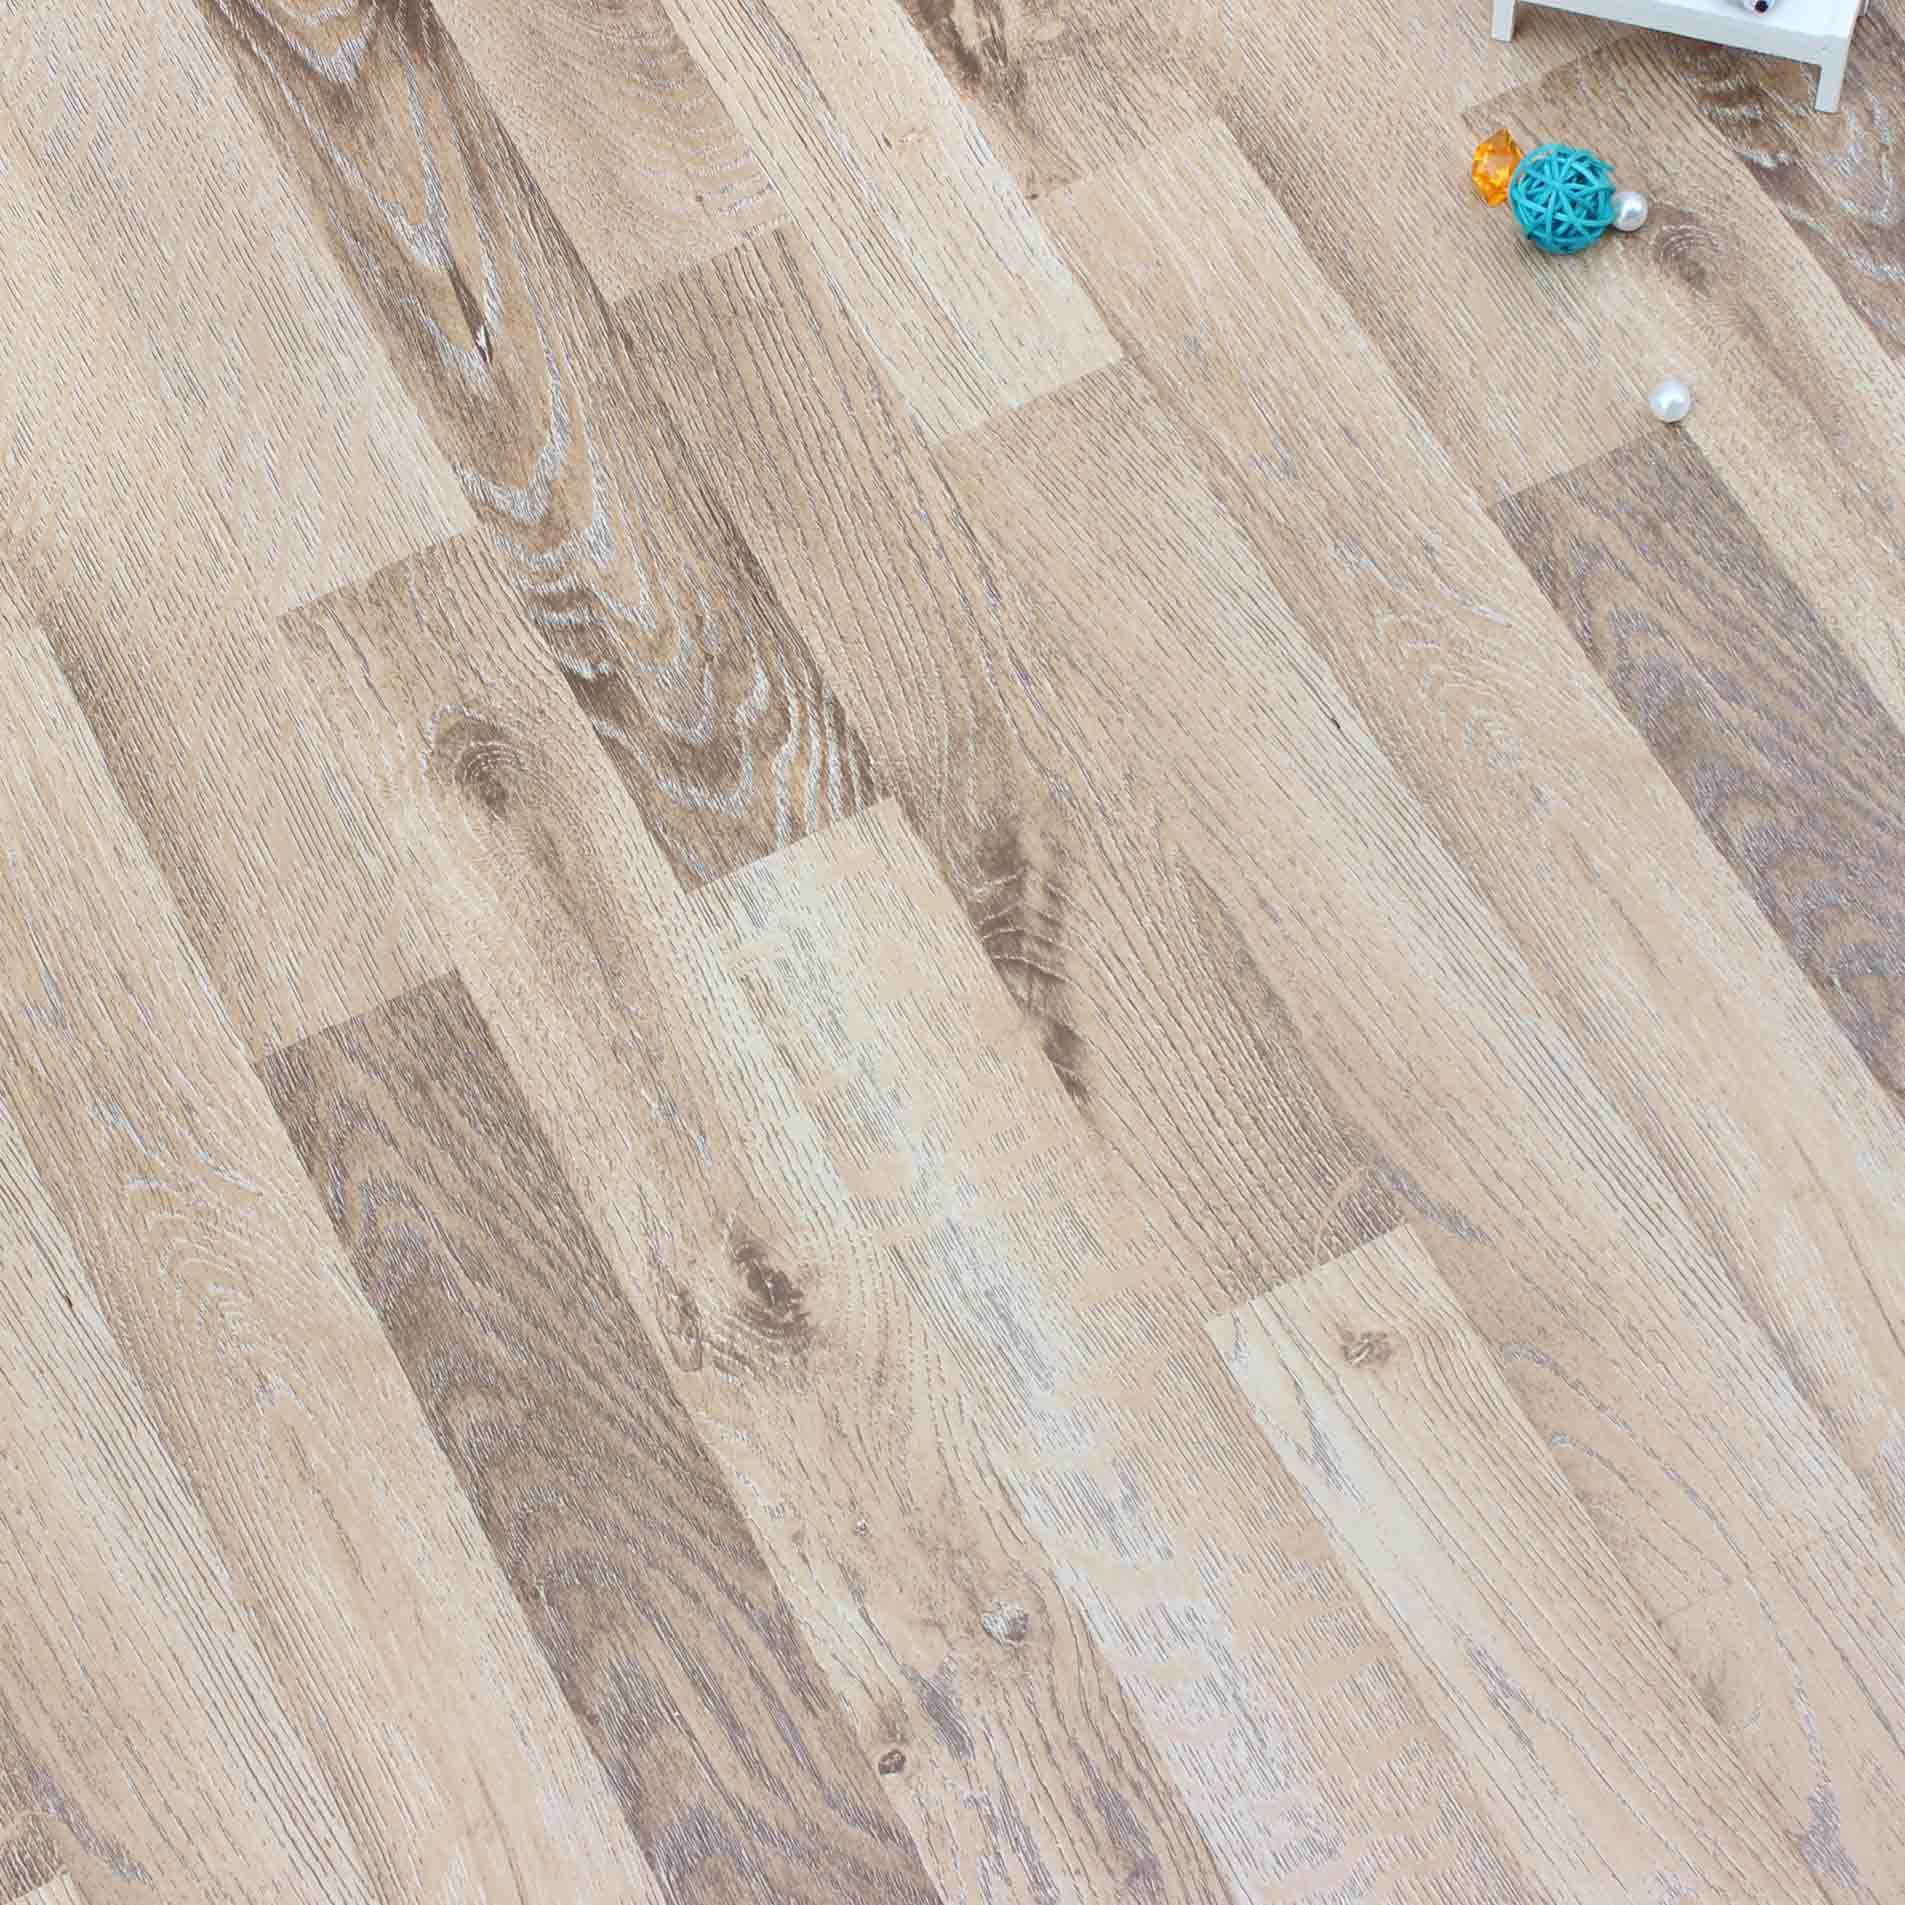 German Technology Hdf Ac3 Ac4 Laminated Floor